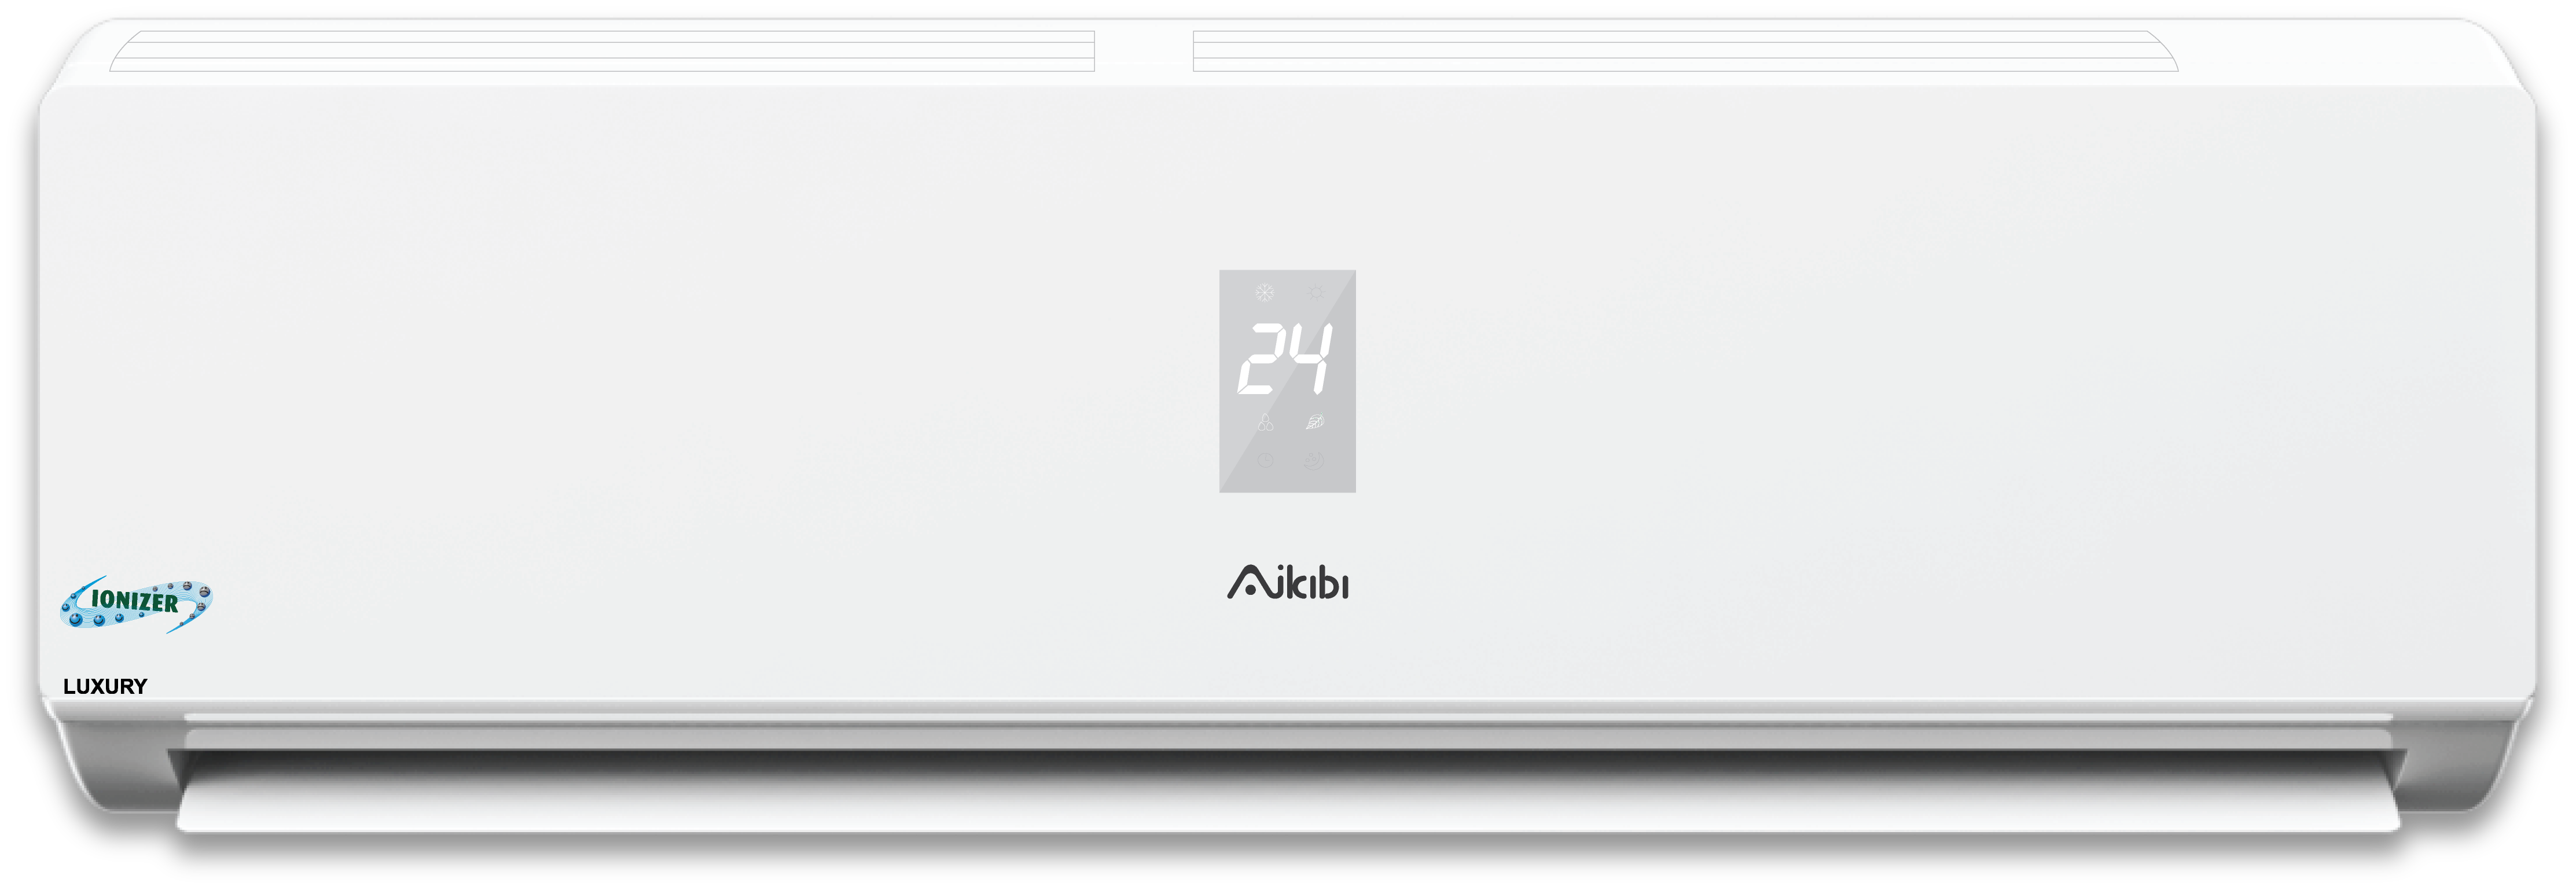 MÁY LẠNH AIKIBI 2.0 HP DC INVERTER HWS18C - SW